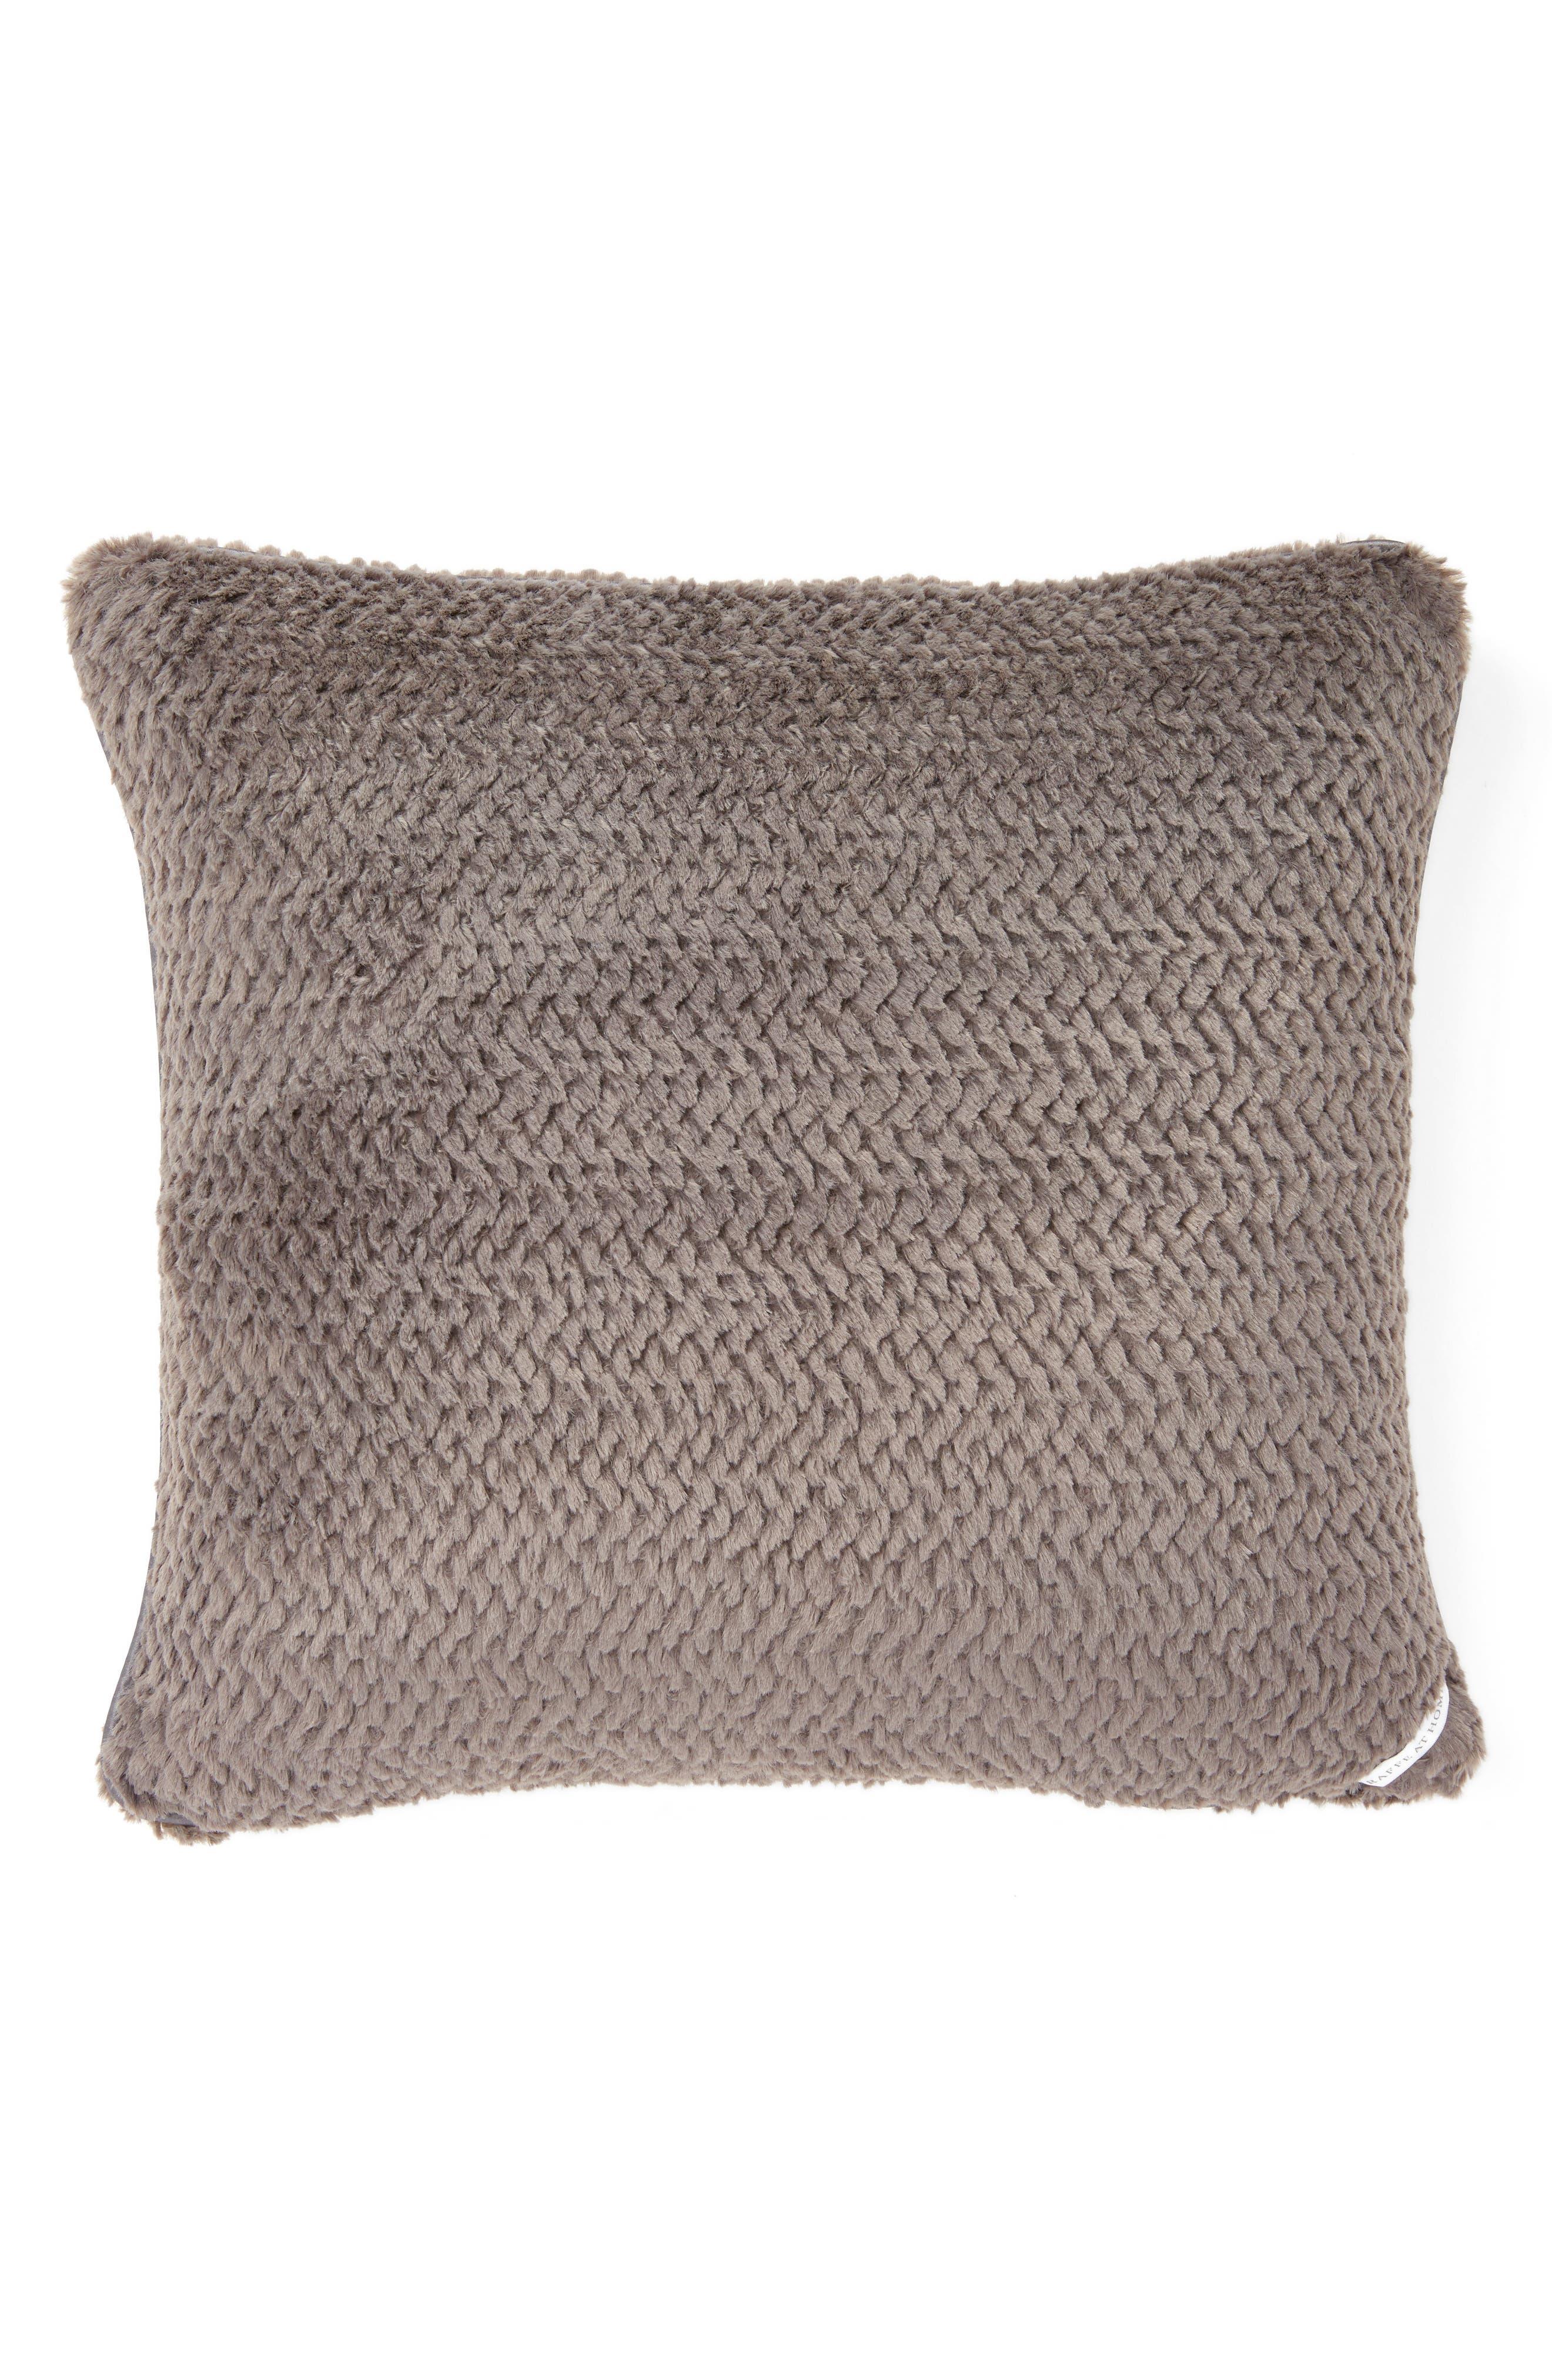 Main Image - Giraffe at Home Luxe™ Twist Pillow